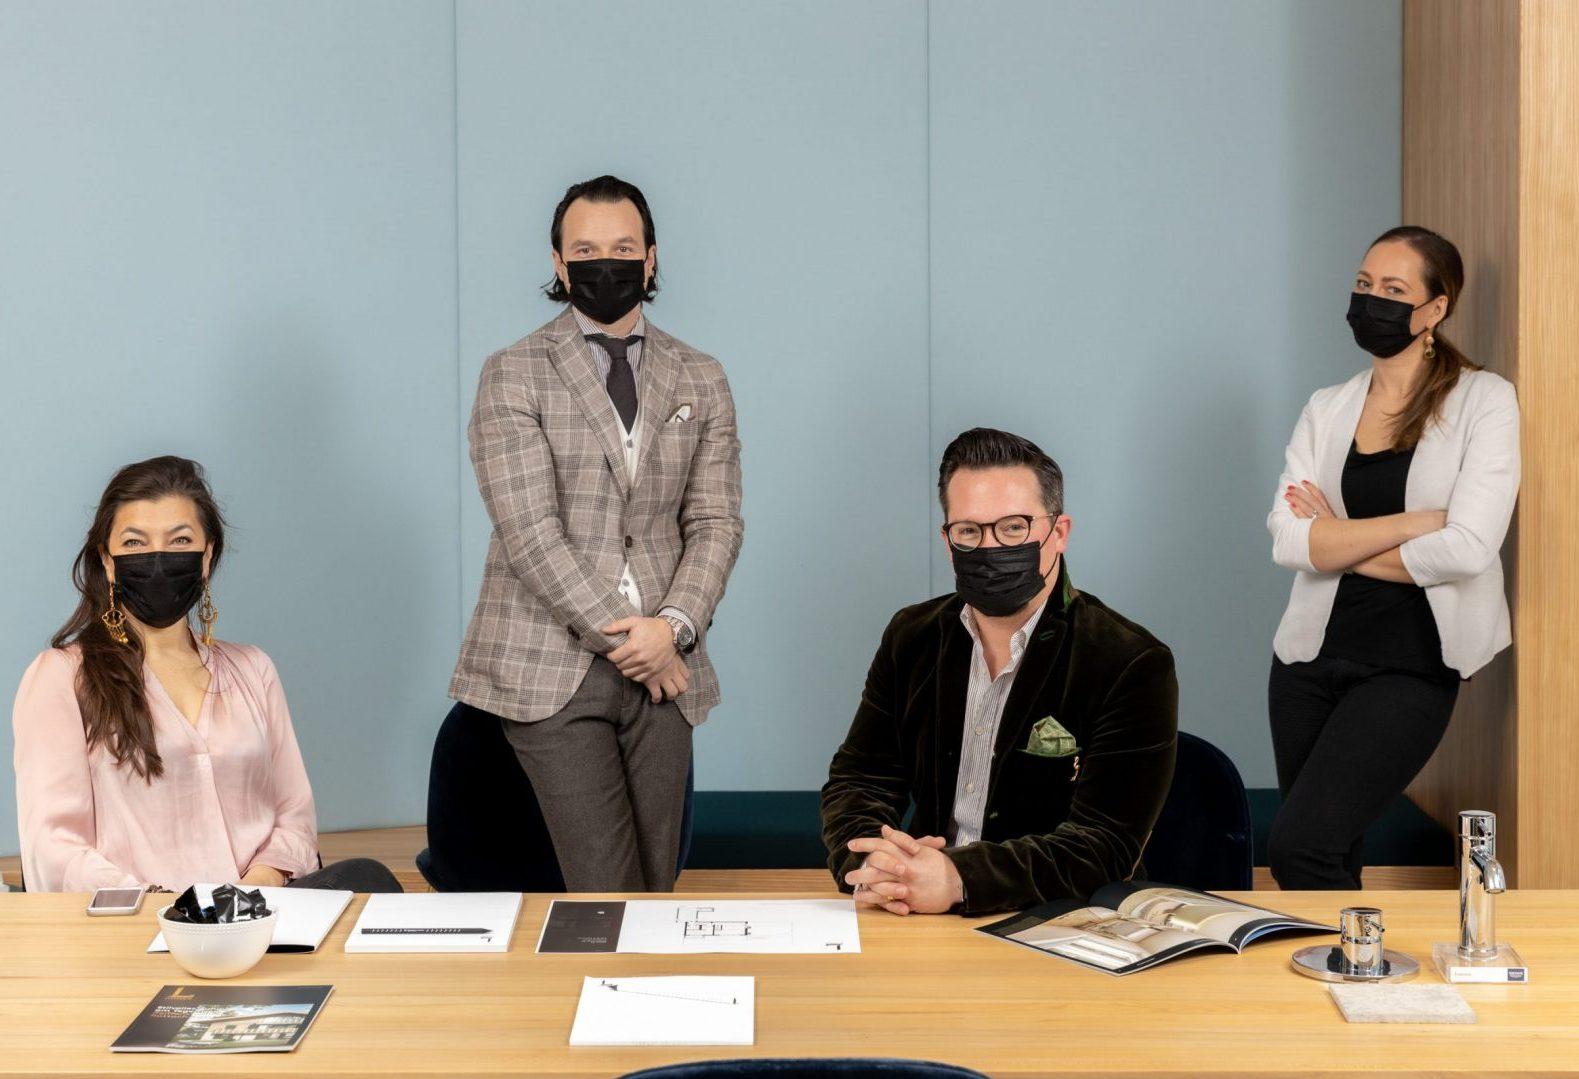 L HOMES Beratungsgespräch Corona Showroom Vertrieb Masken